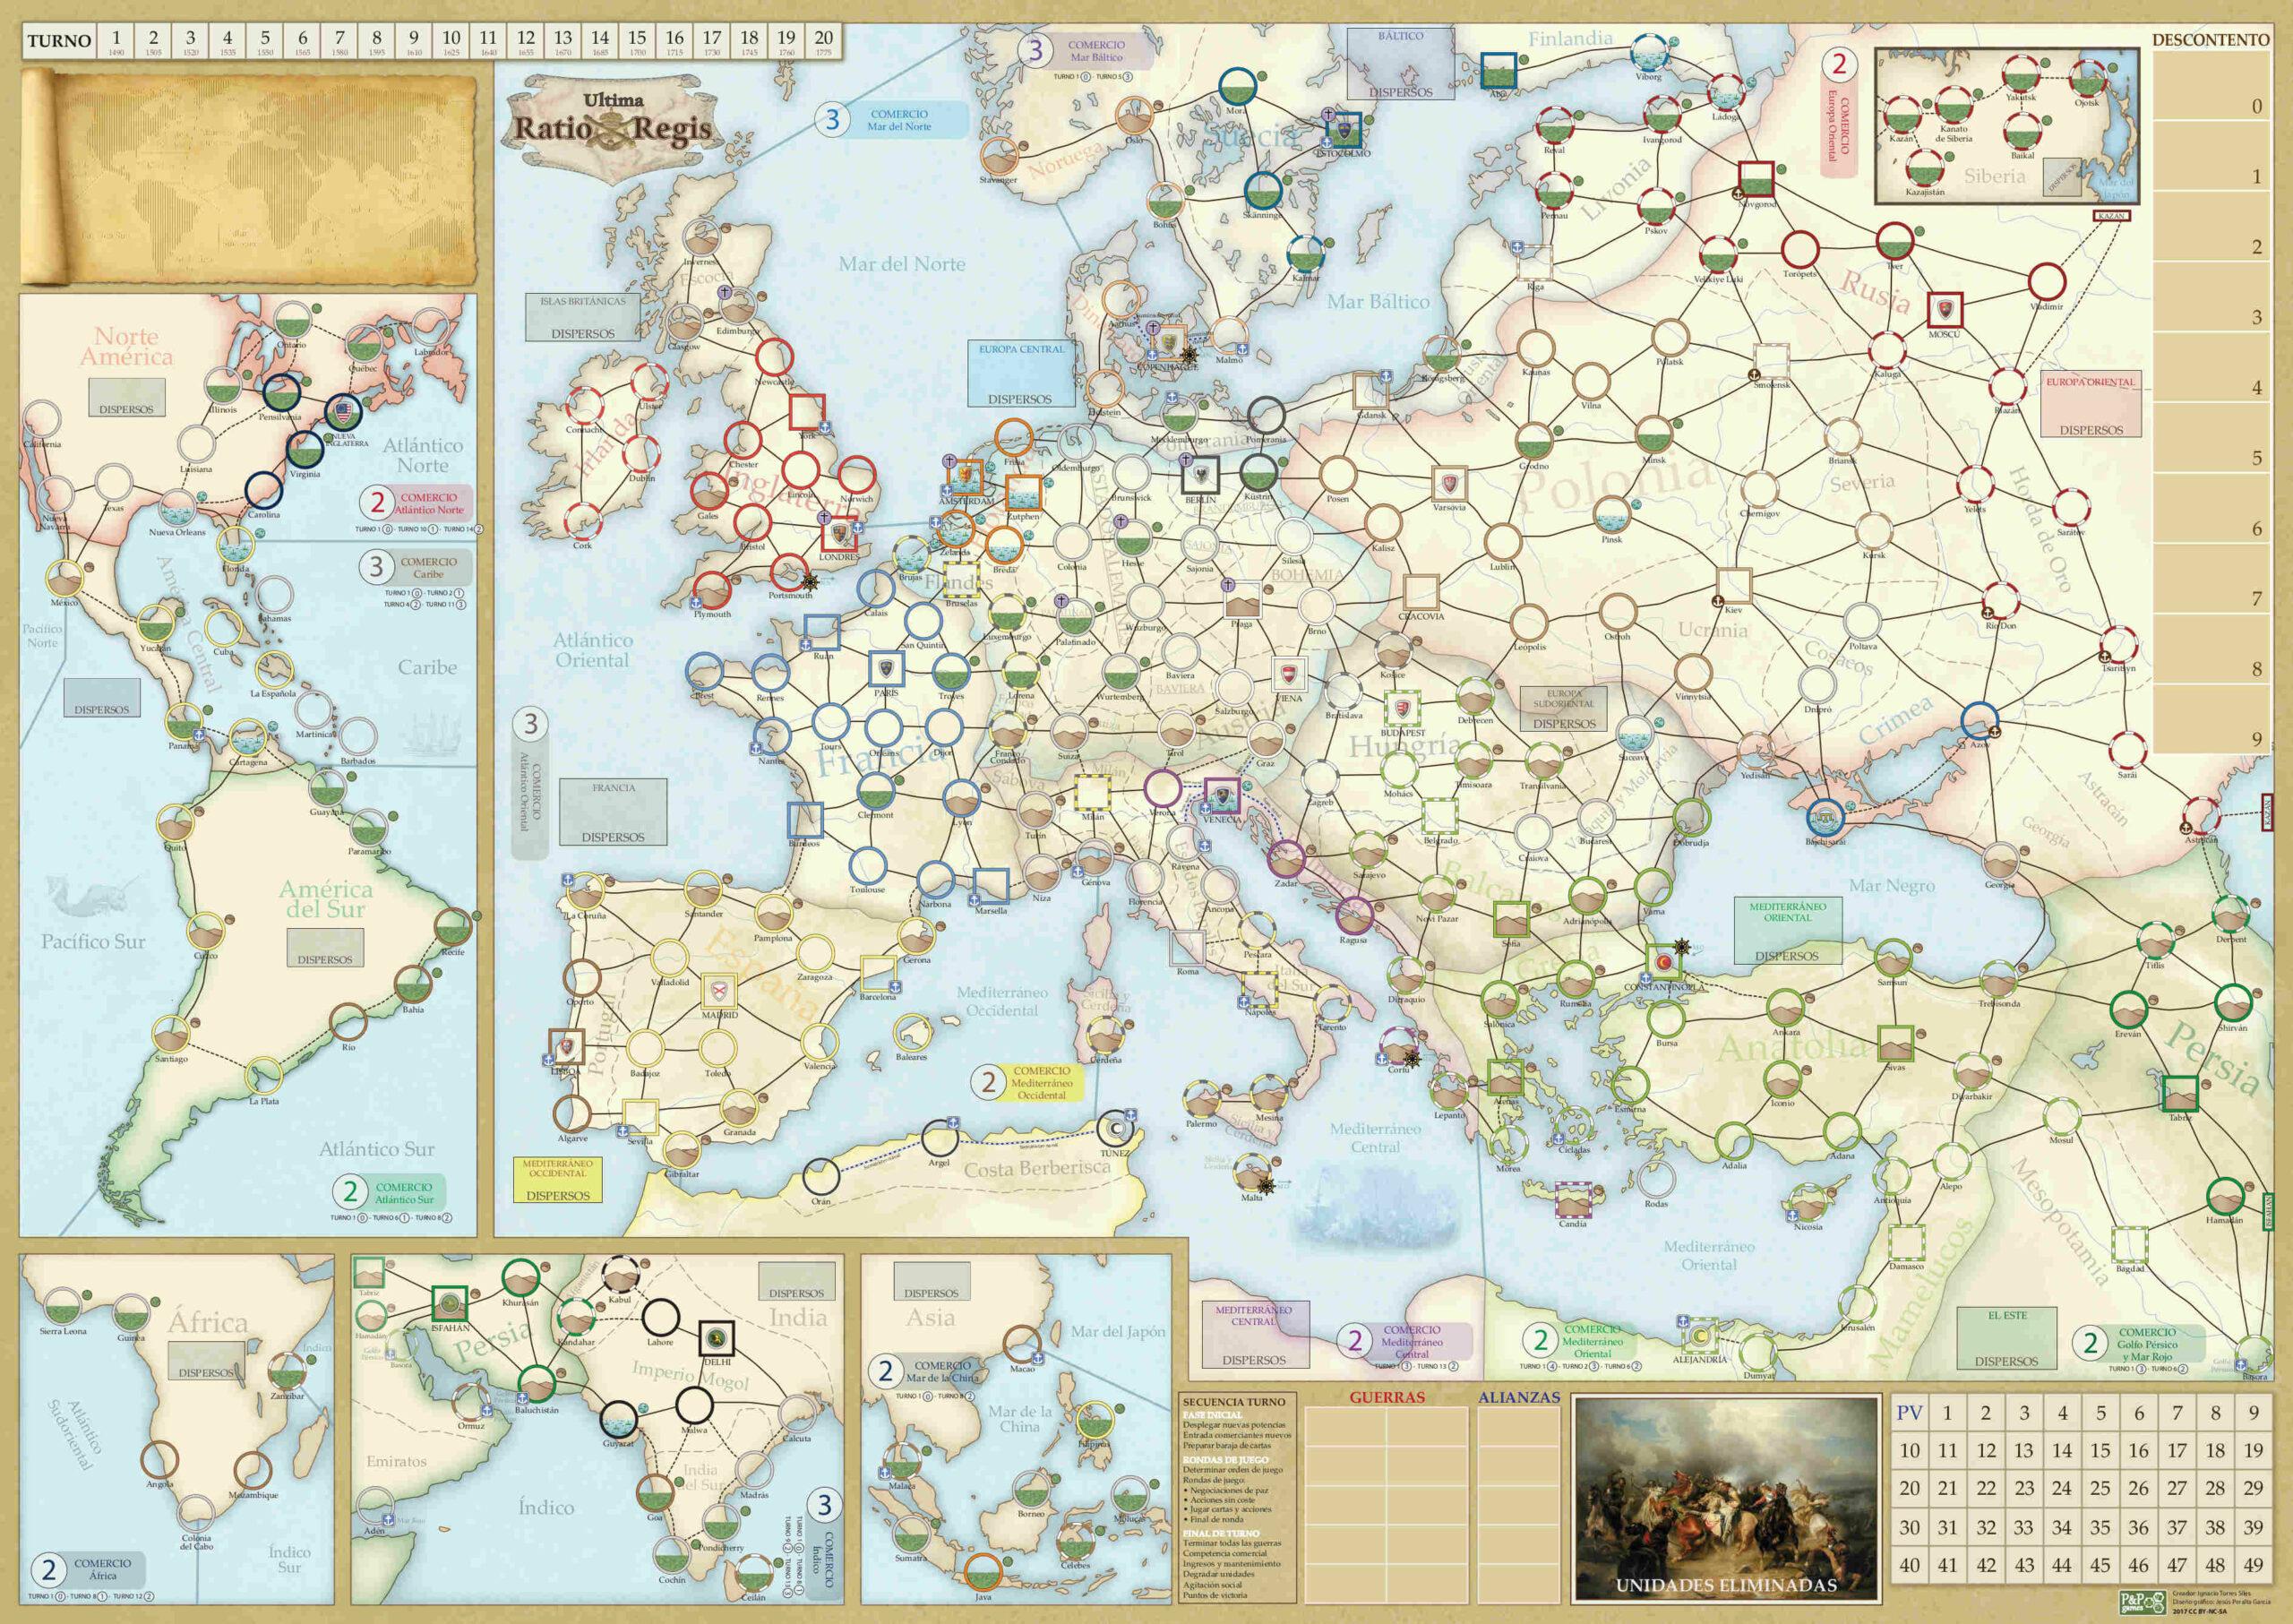 Mapa Ultima Ratio Regis